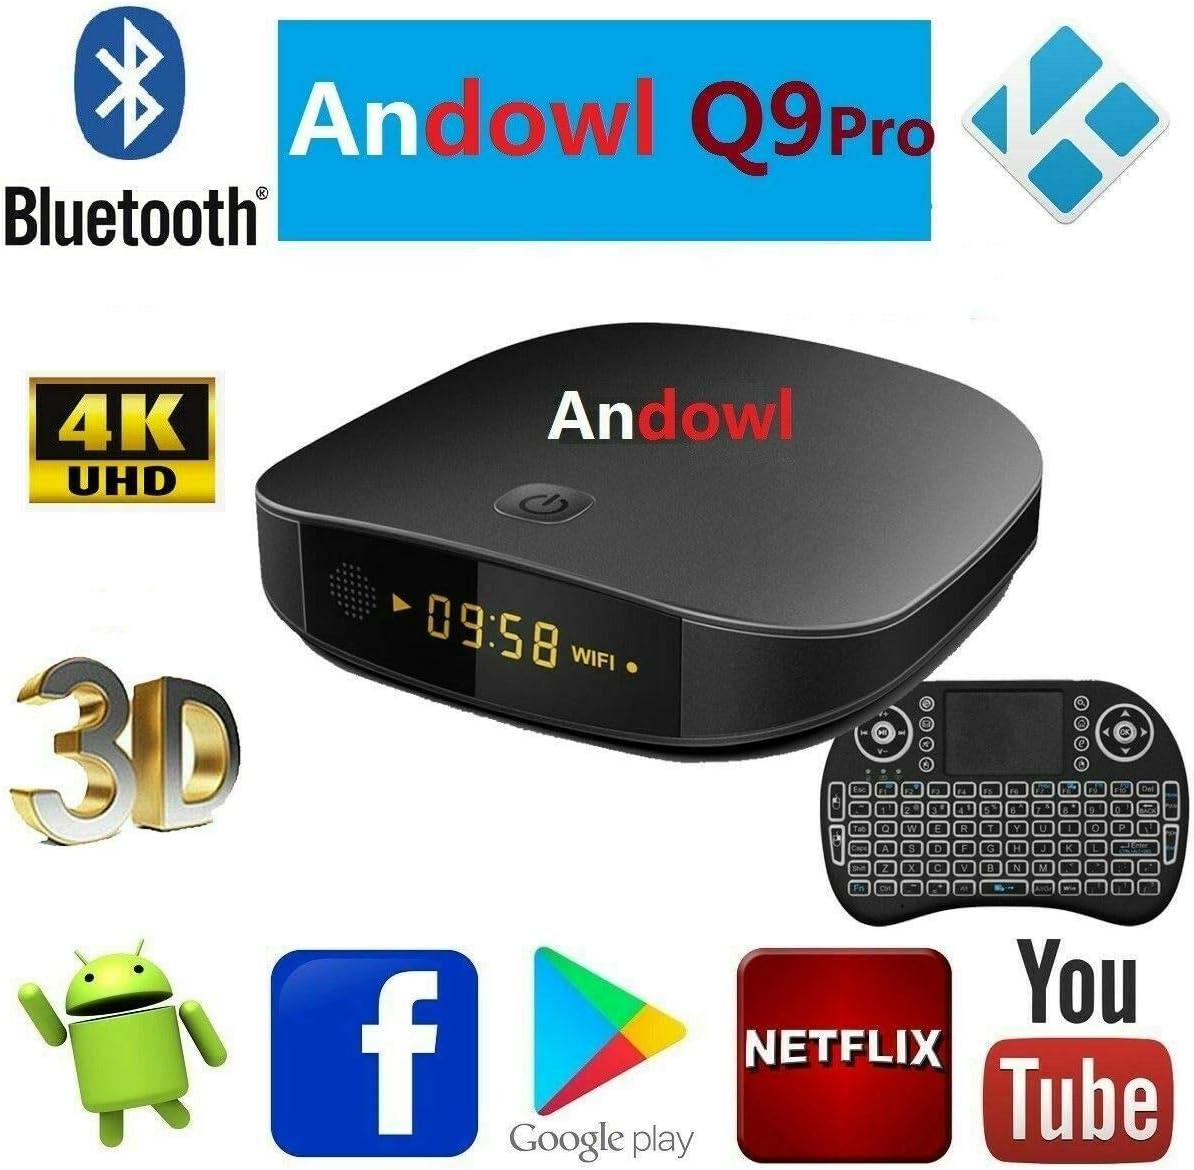 Smart TV Box ANDOWL Q9 Pro Android 7.1.2 4K 4GB RAM 32 GB ROM IPTV con Teclado 5-Wireless: Amazon.es: Electrónica